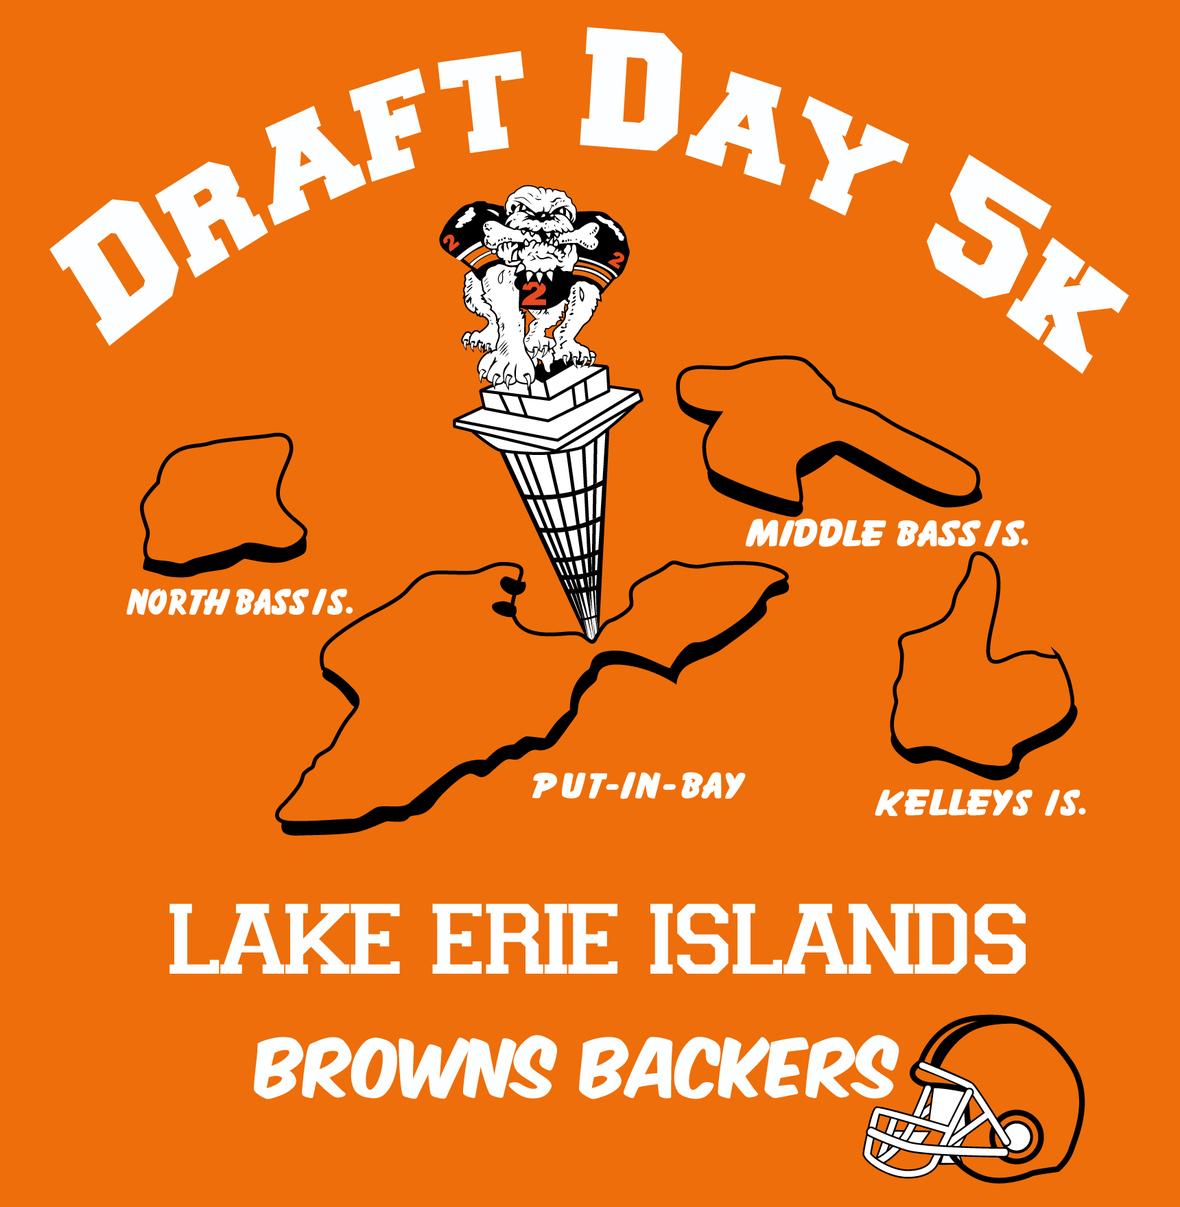 Draft Day 5k at Put-in-Bay